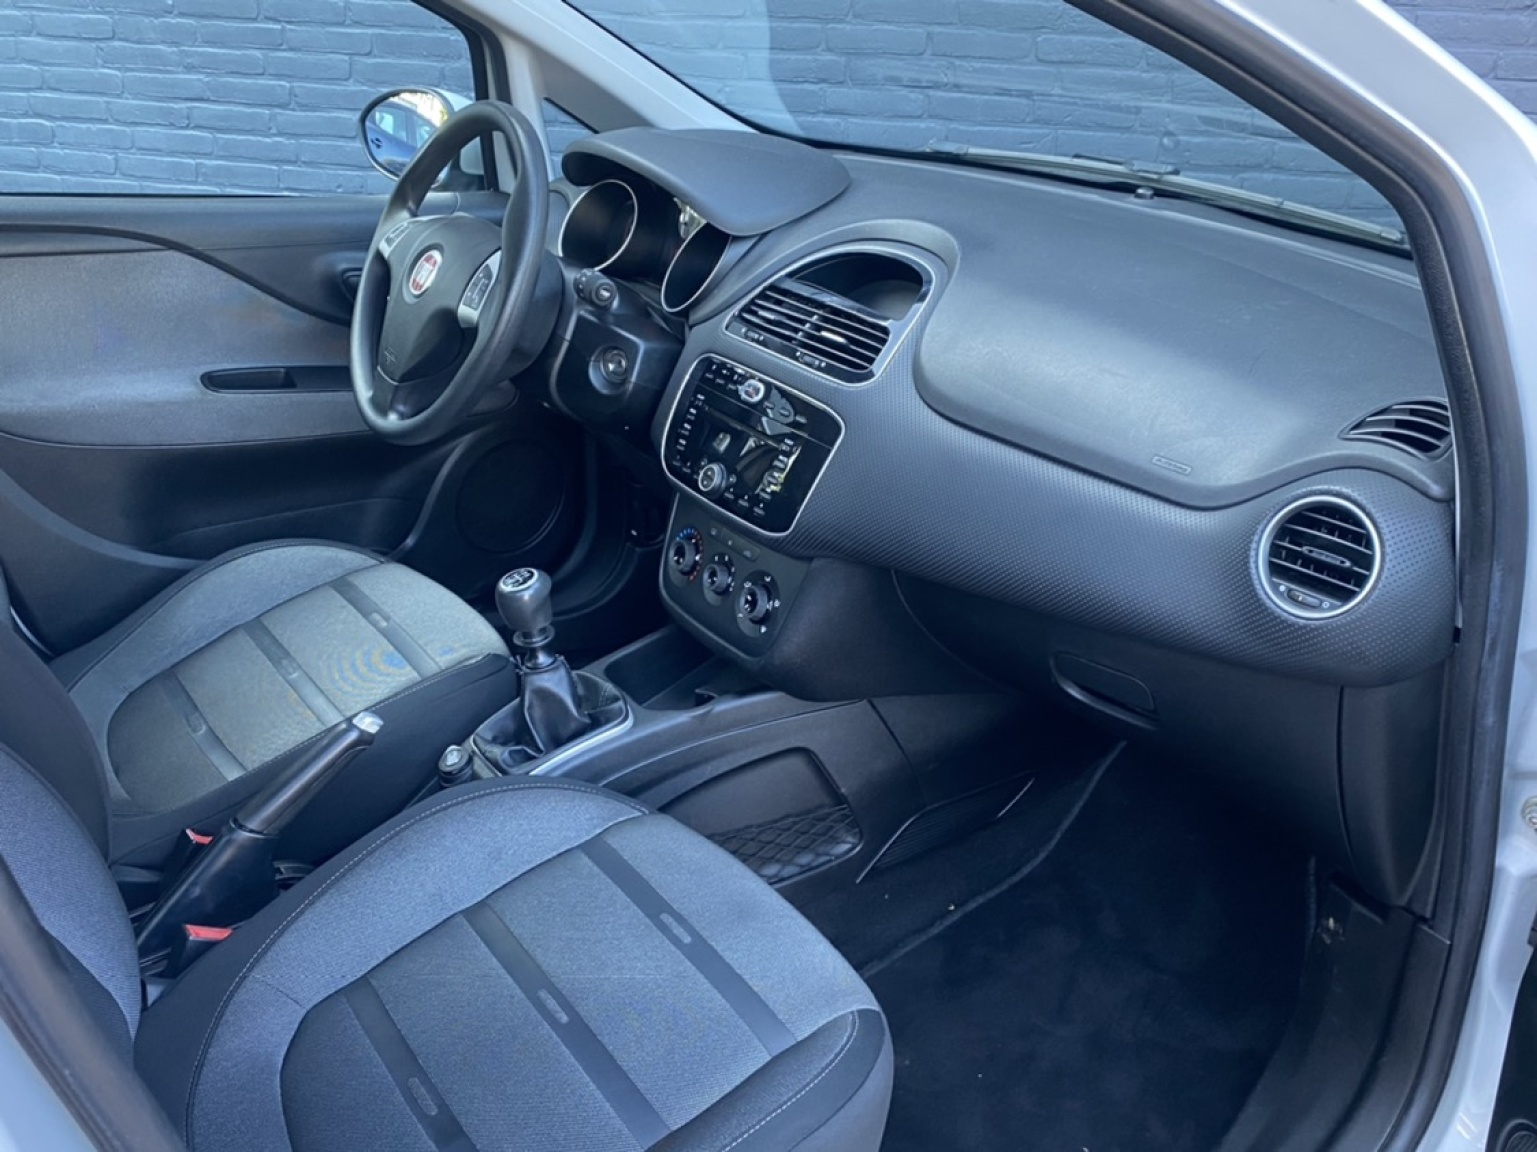 Fiat-Punto Evo-18